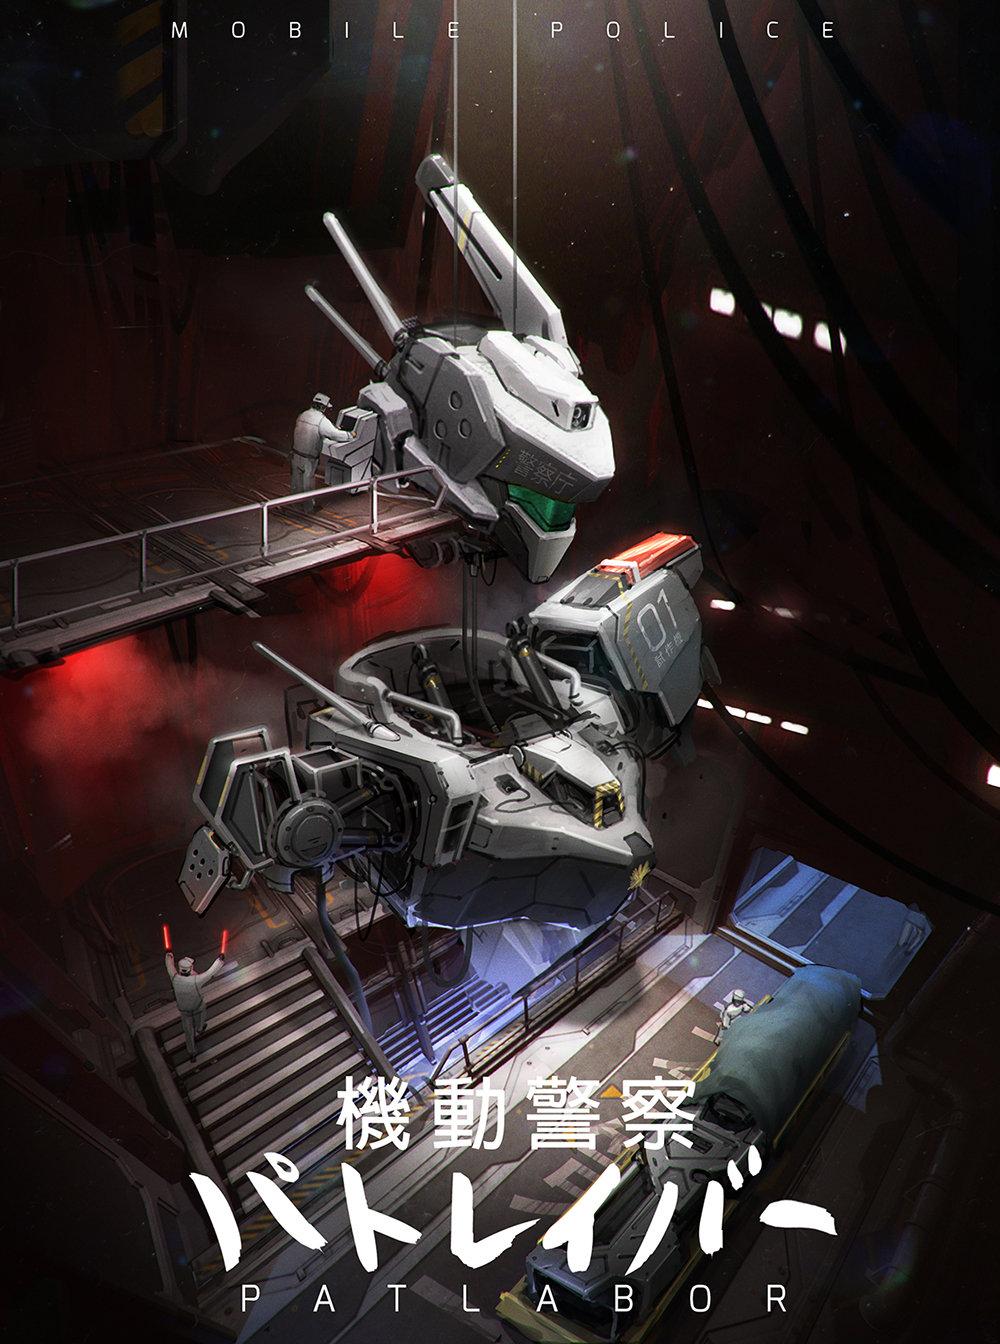 Anime Wallpaper Hd Mobile Johnson Ting S Video Game Art